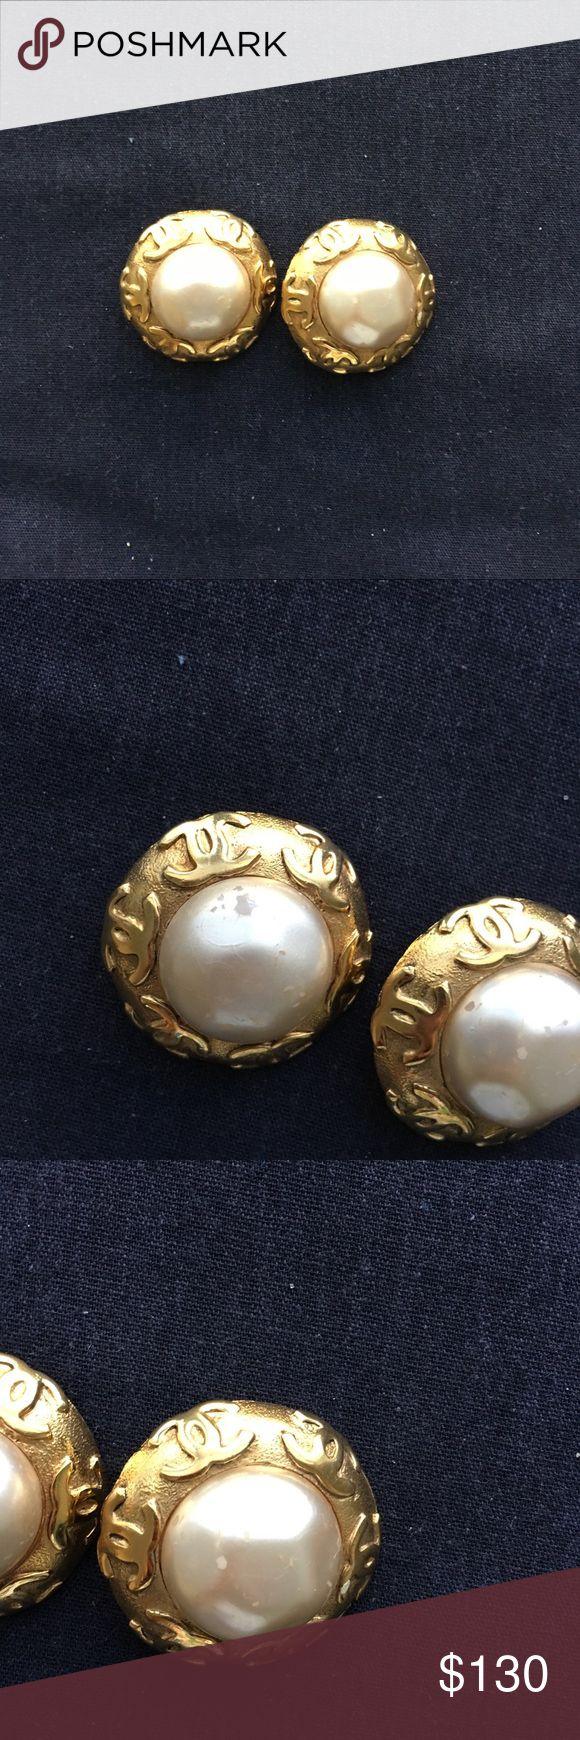 chanel earrings price. chanel 2 9 coll jumbo earrings repost price drop price